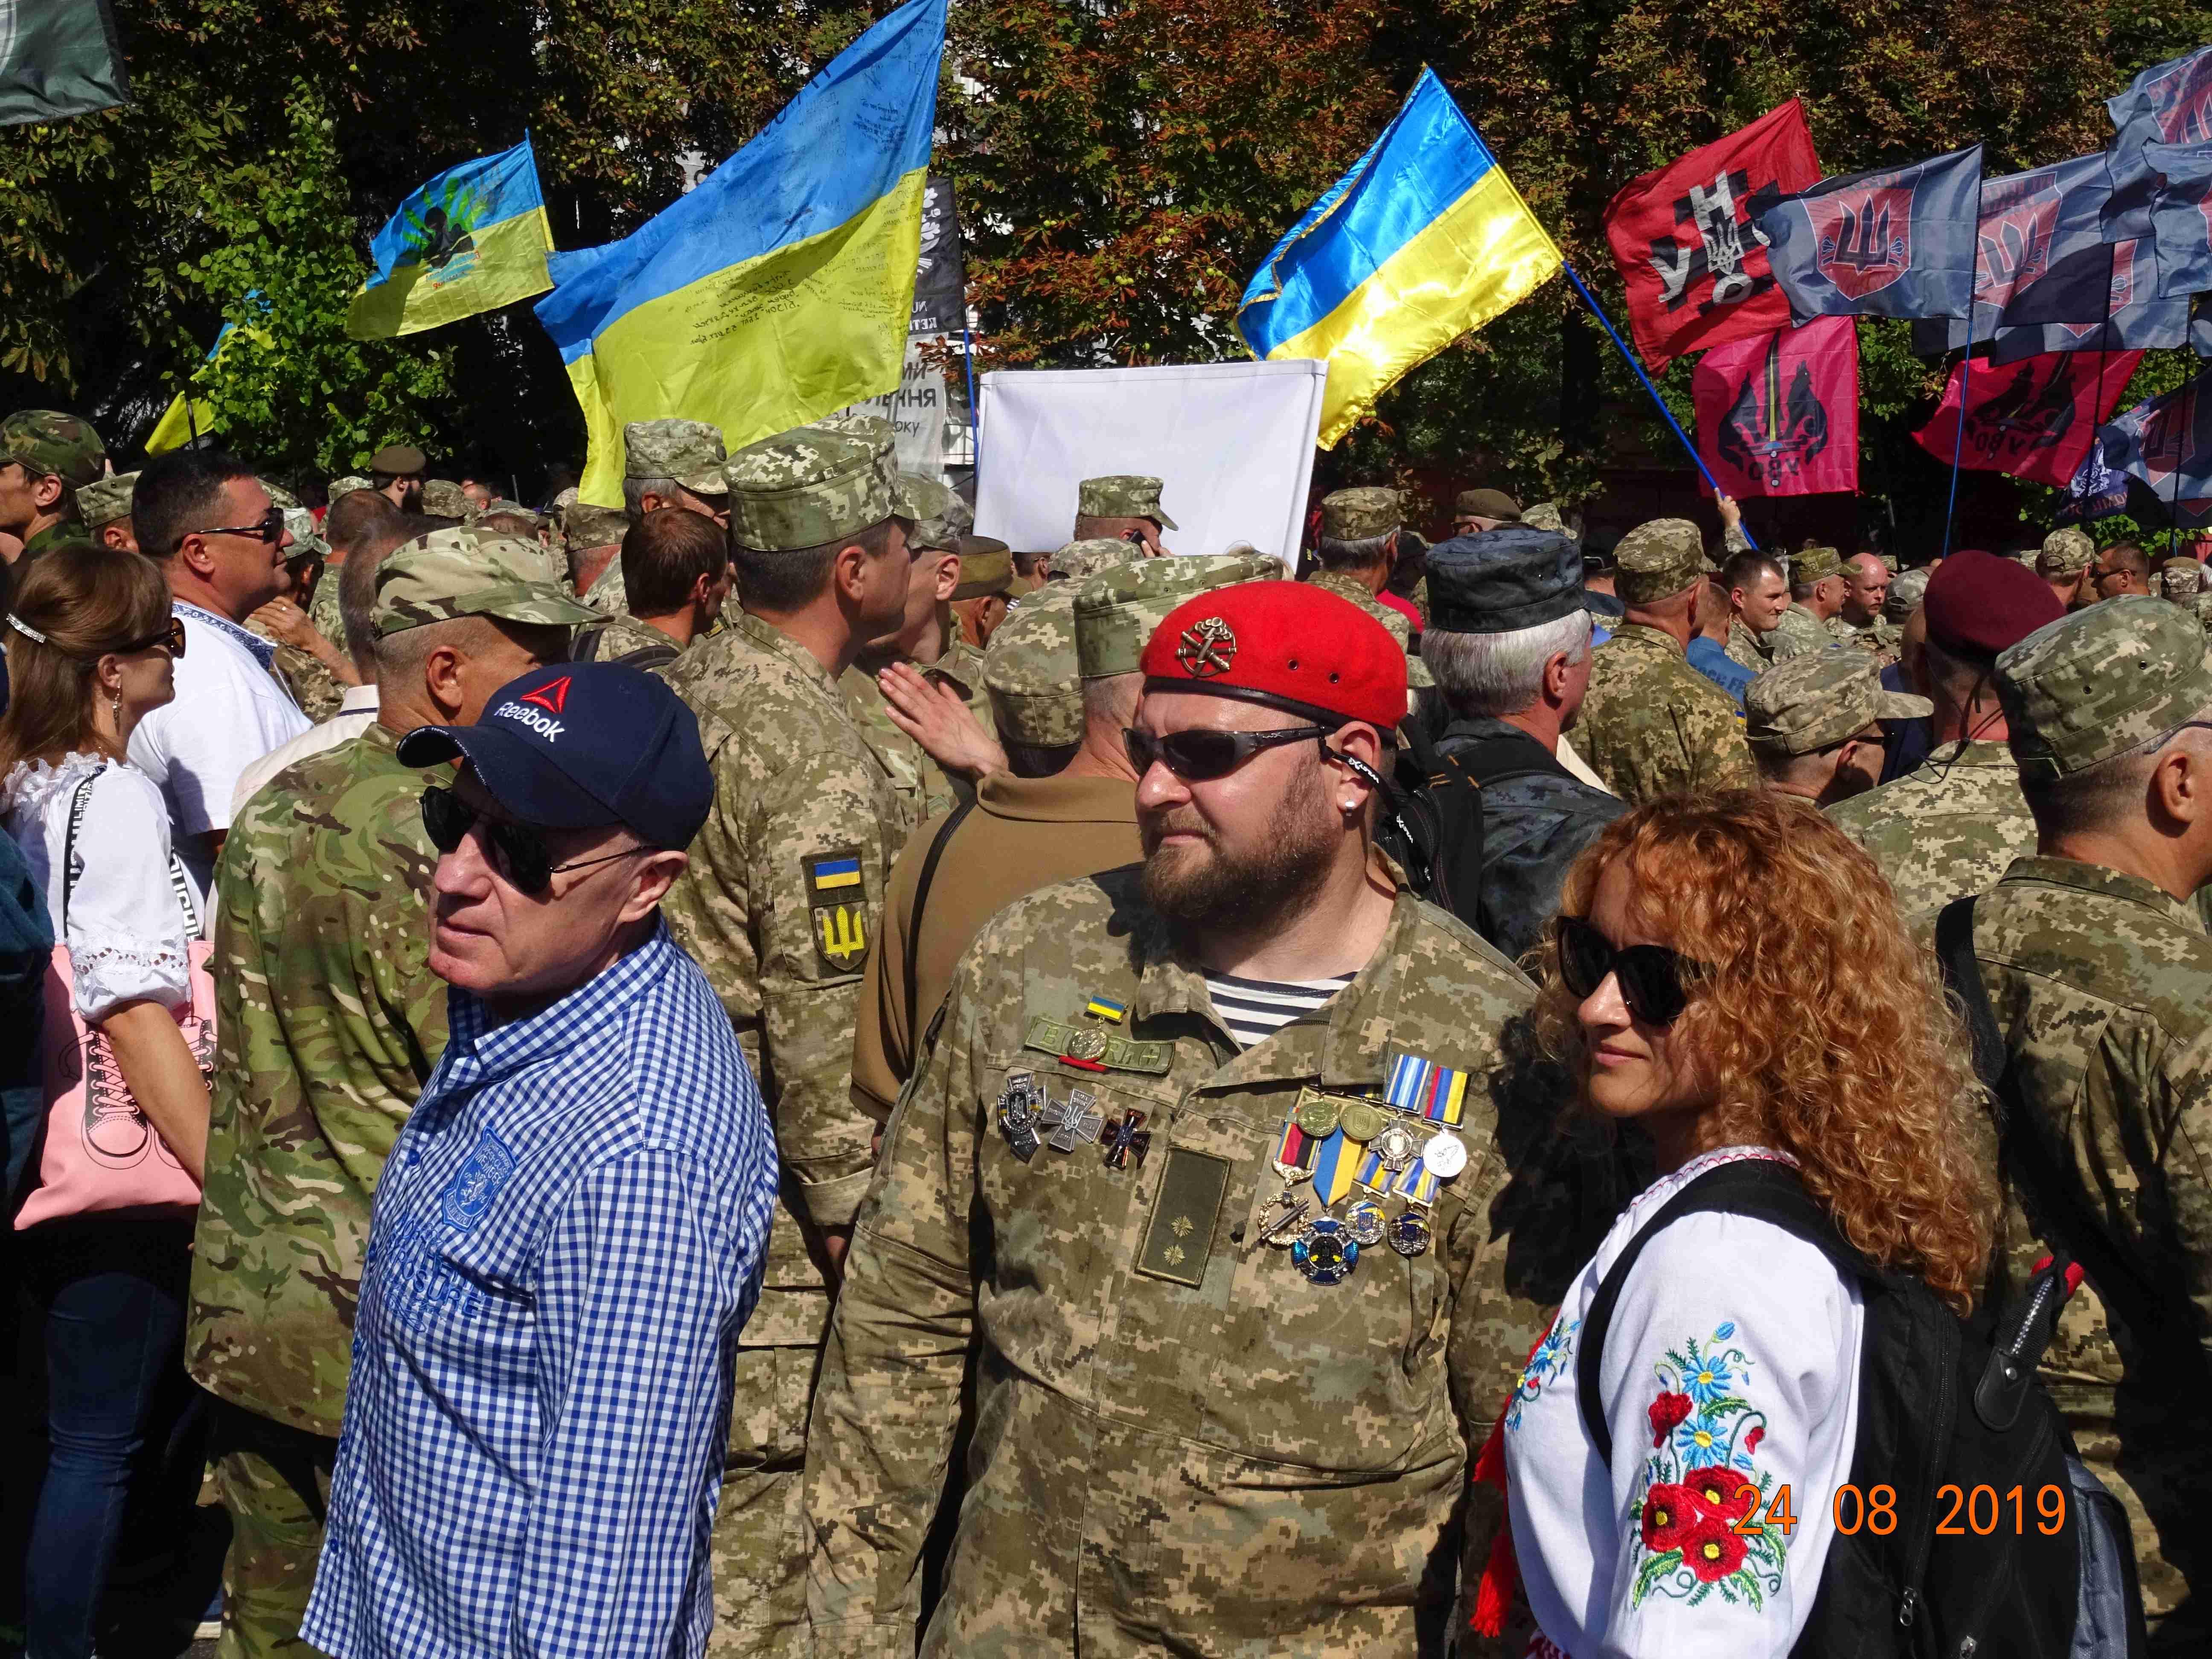 Defenders-of-Ukraine-Parad-24.Aug.19 - DSC06013.jpg